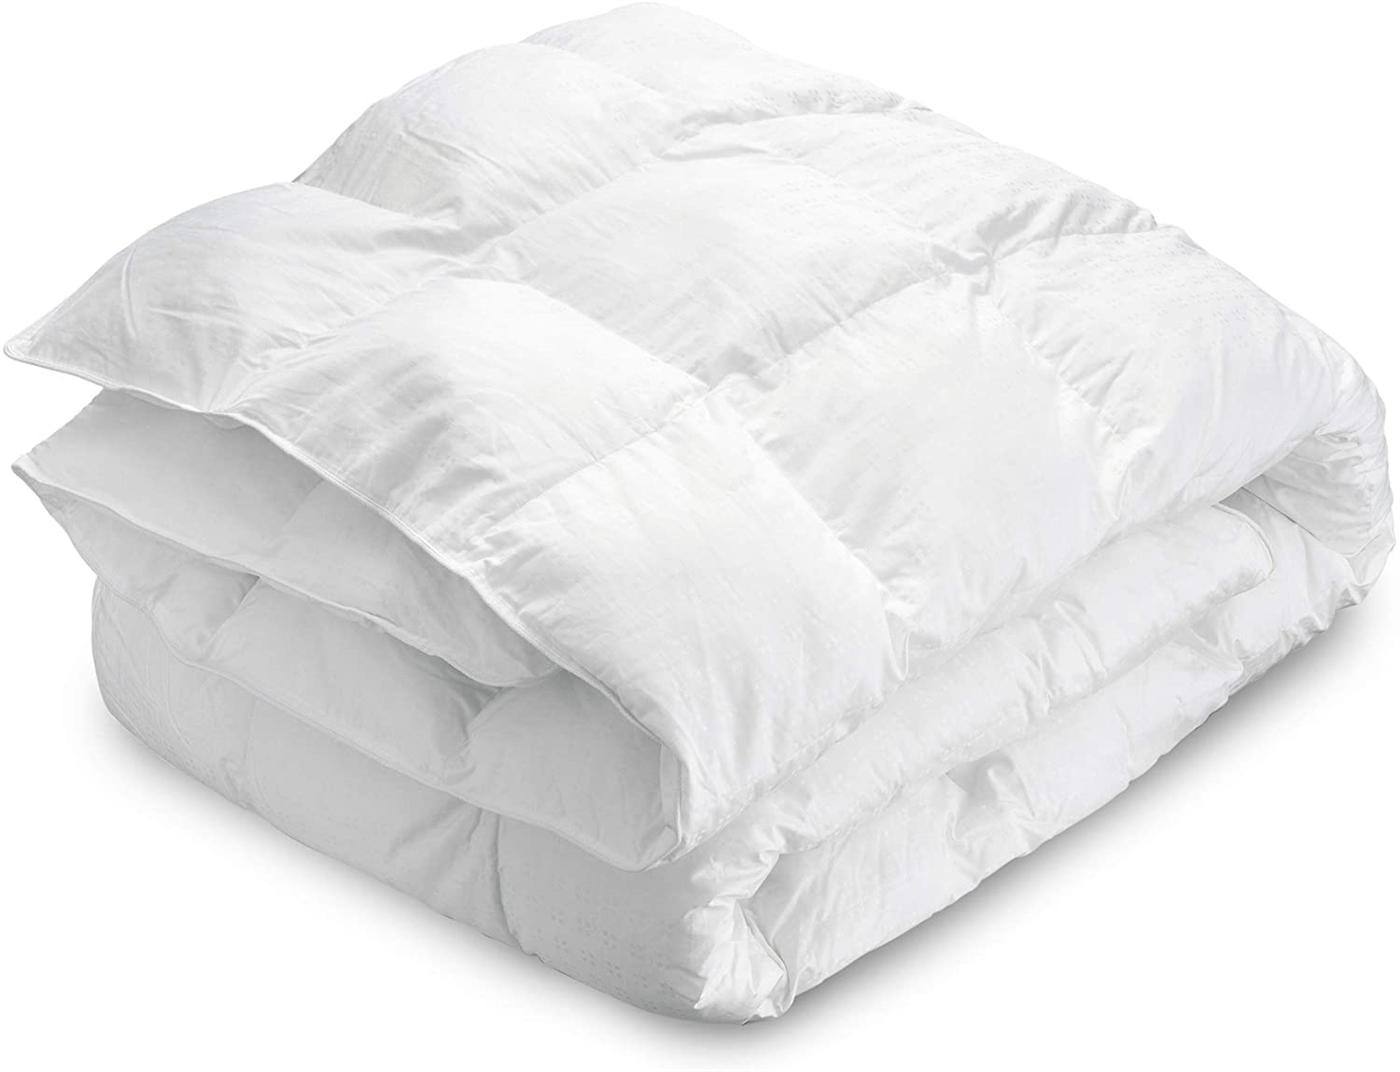 Alternative Down Comforter Discount Luxury Bedding